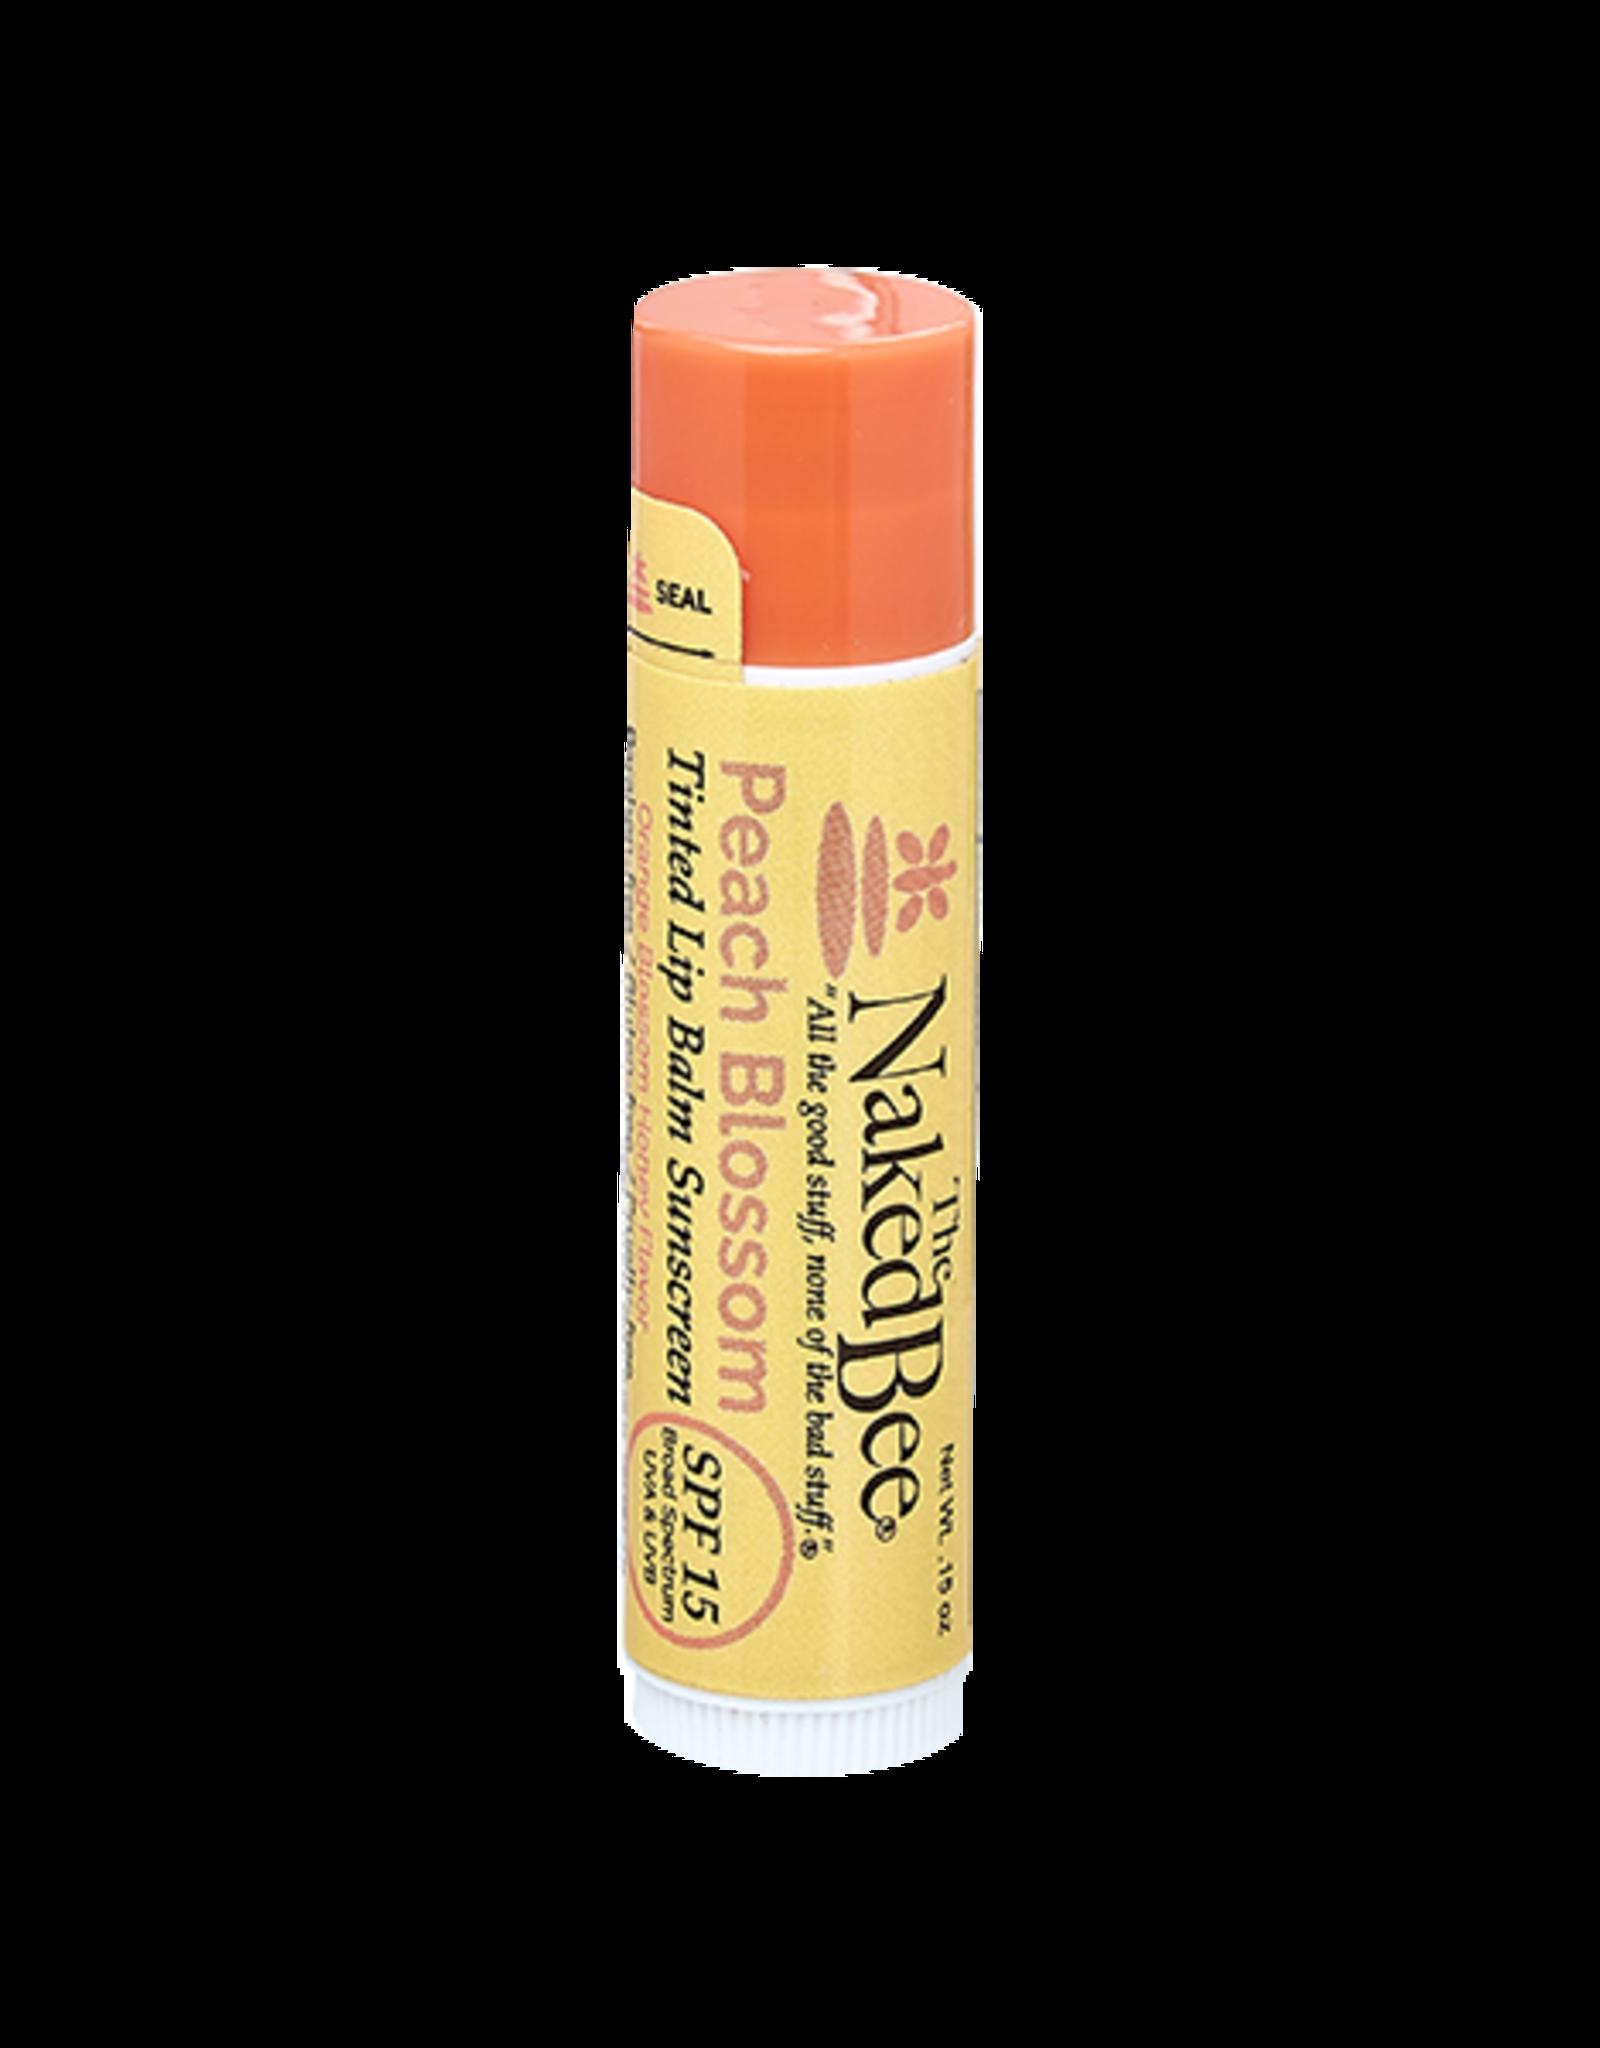 The Naked Bee The Naked Bee   Orange Blossom Honey Peach Blossom SPF Tinted Lip Balm